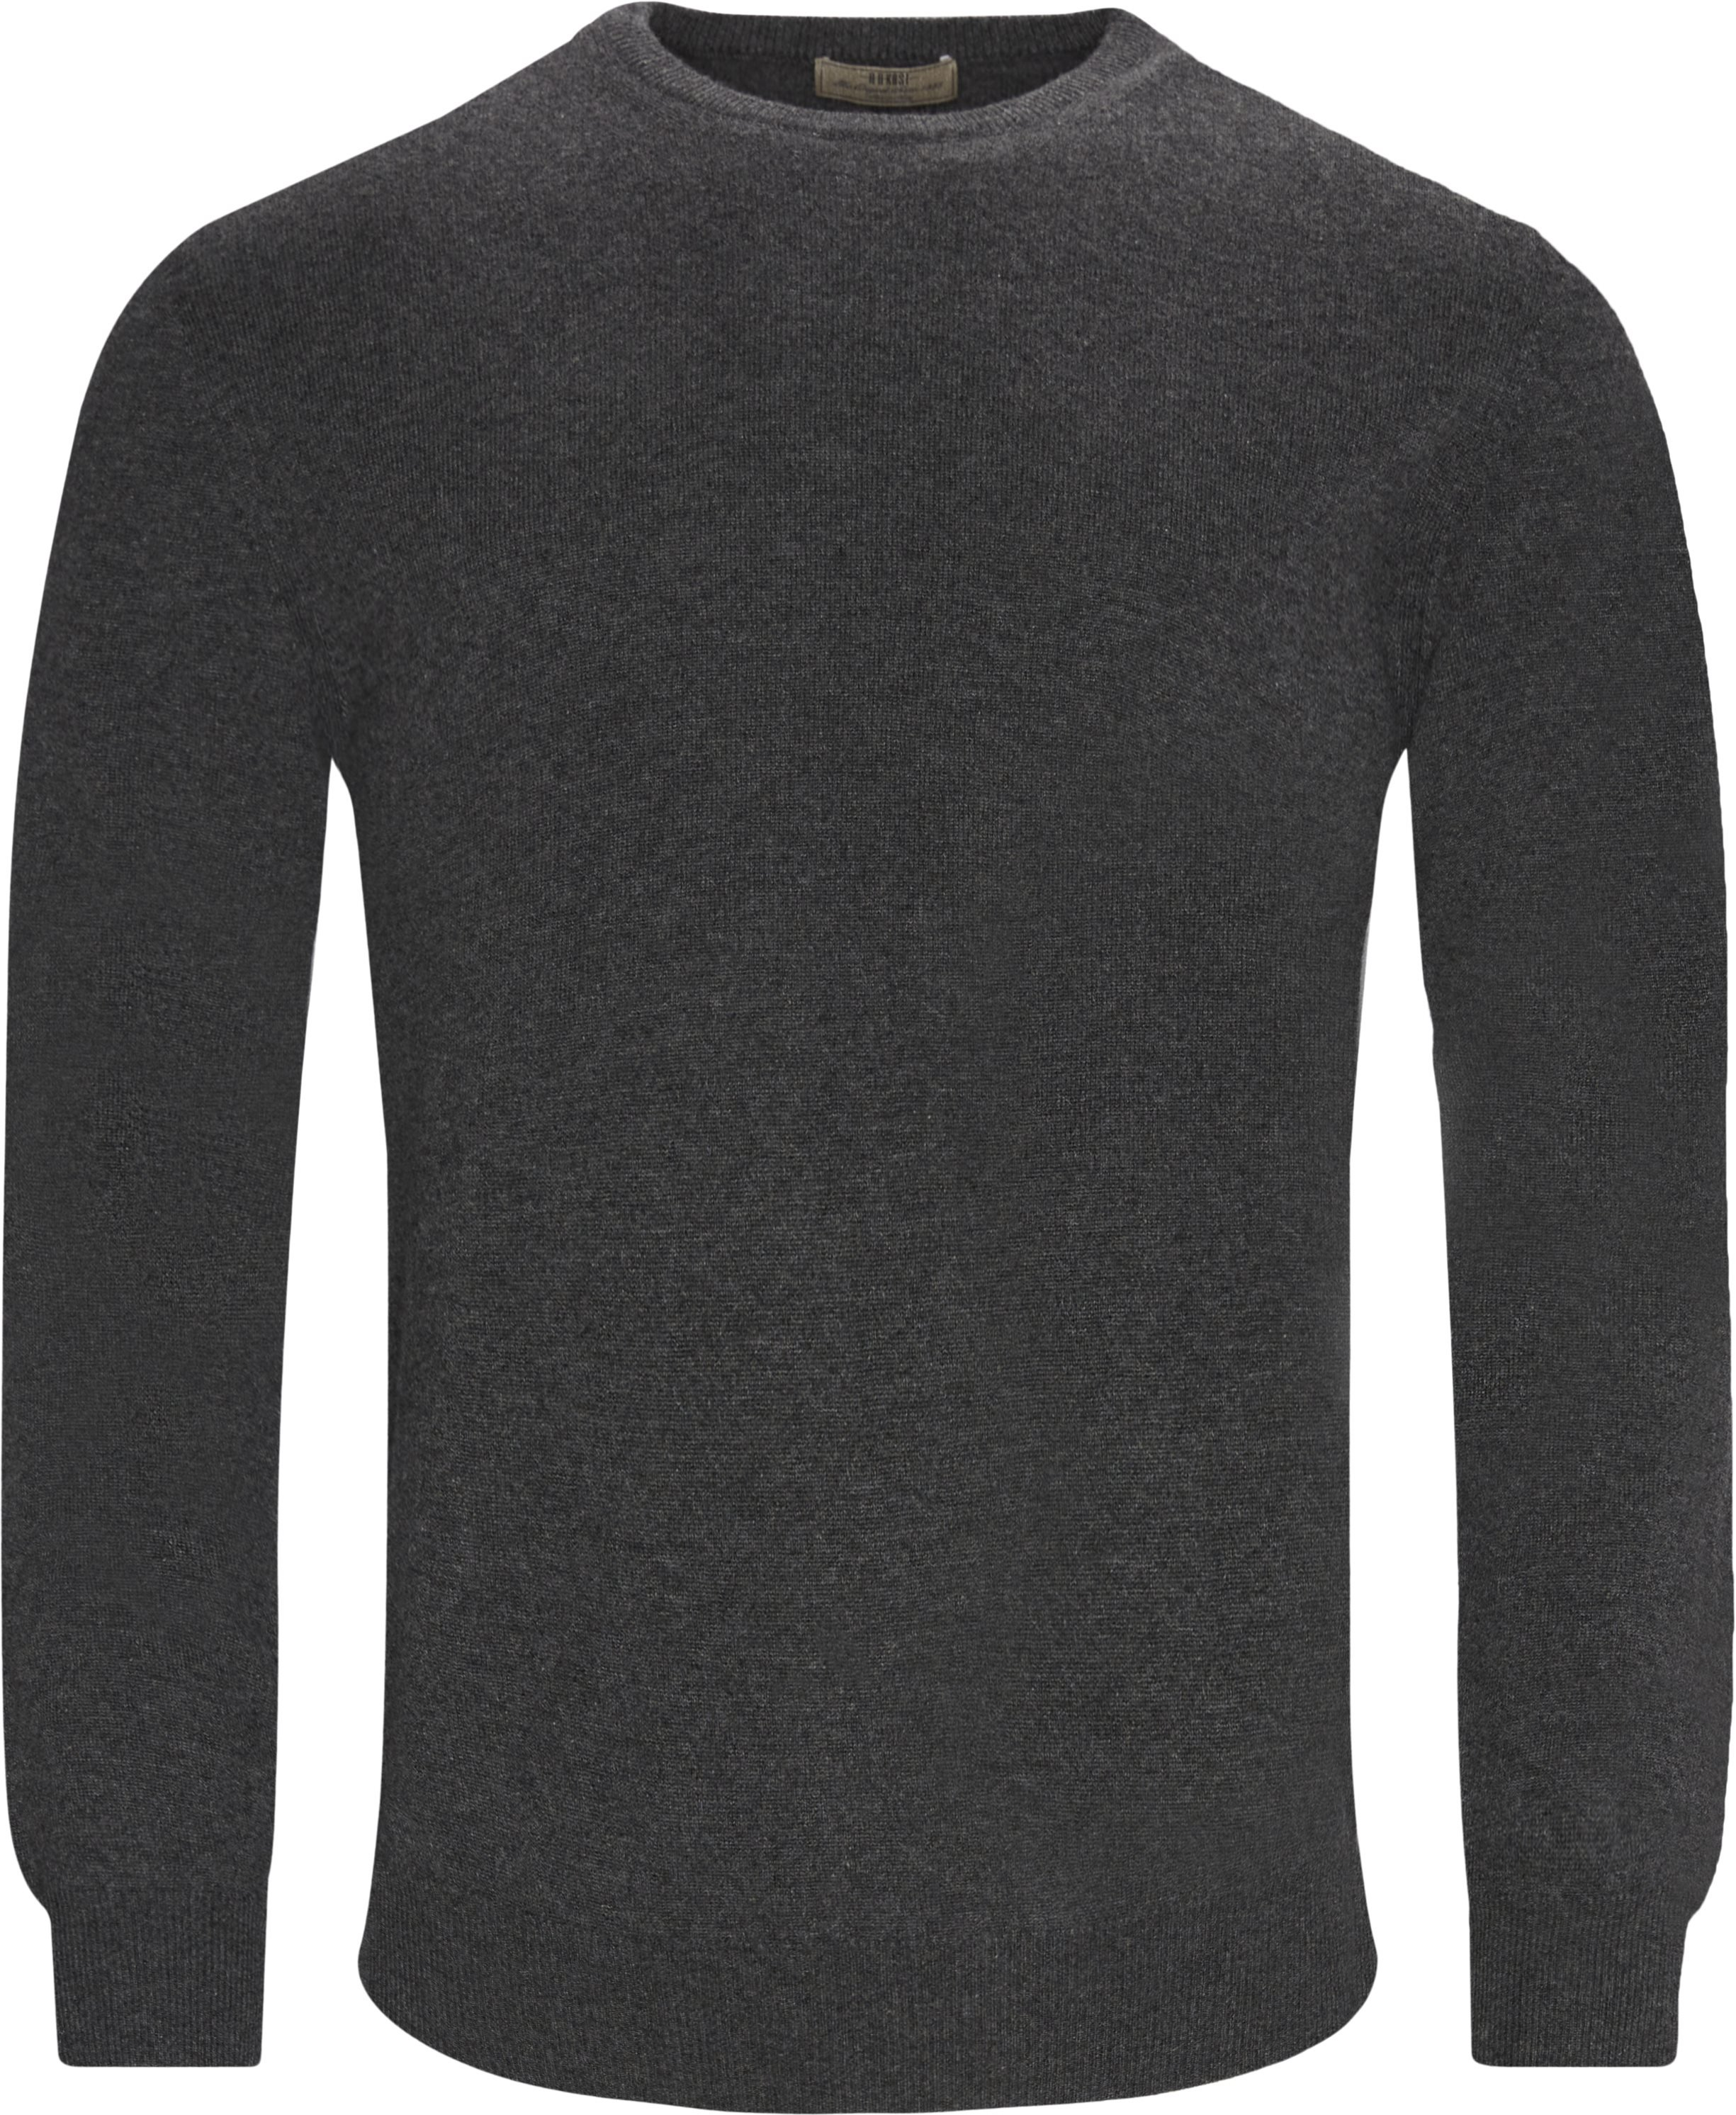 Knitwear - Grey